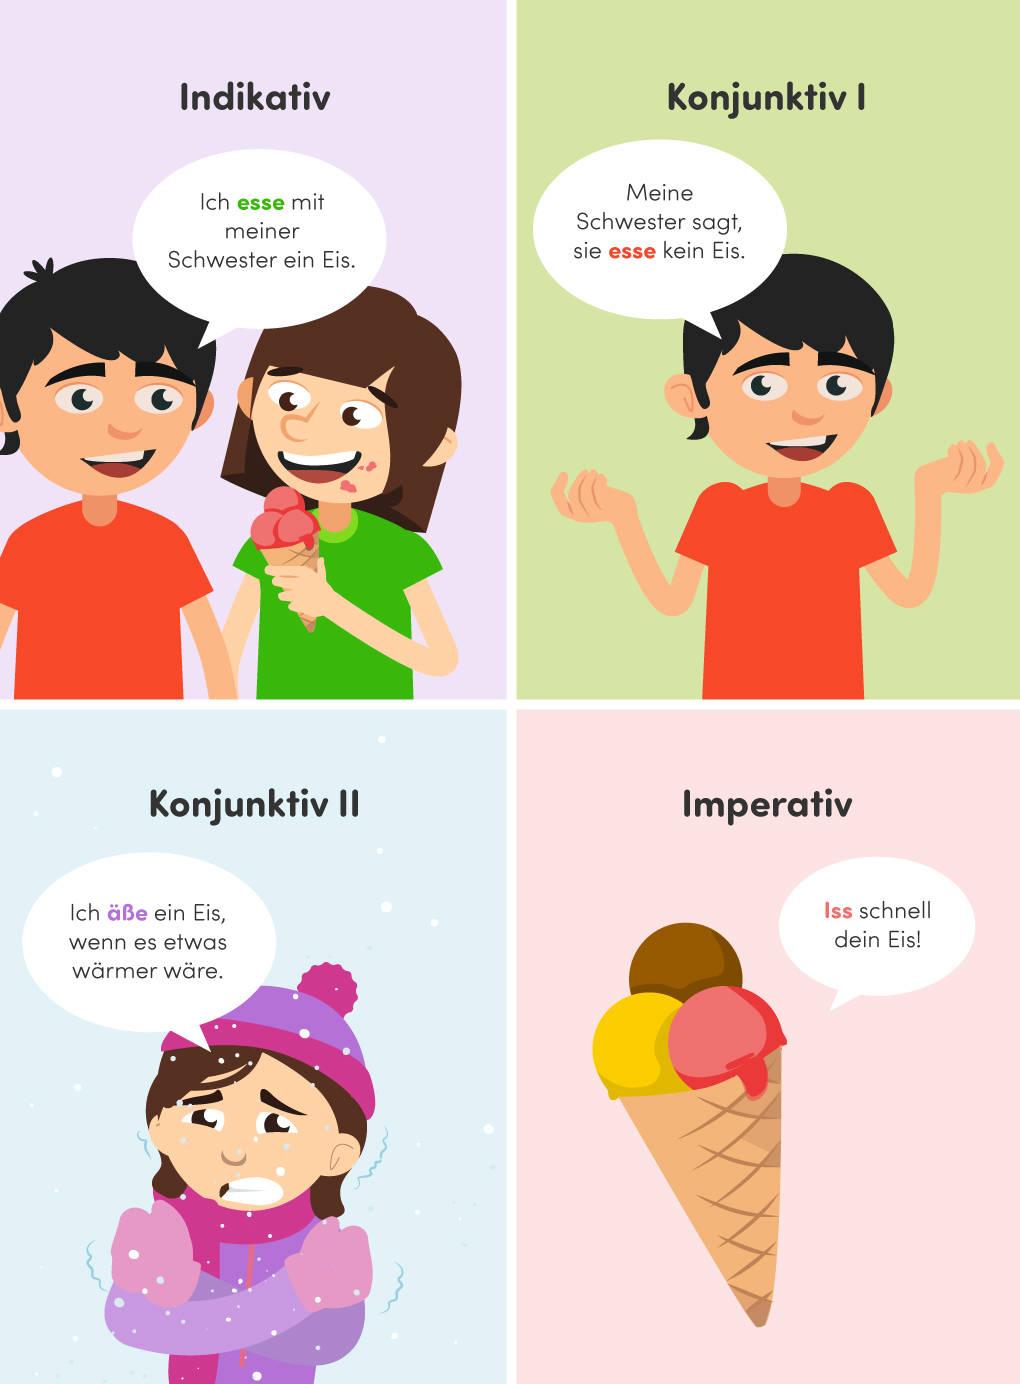 indikativ-konjunktiv-imperativ